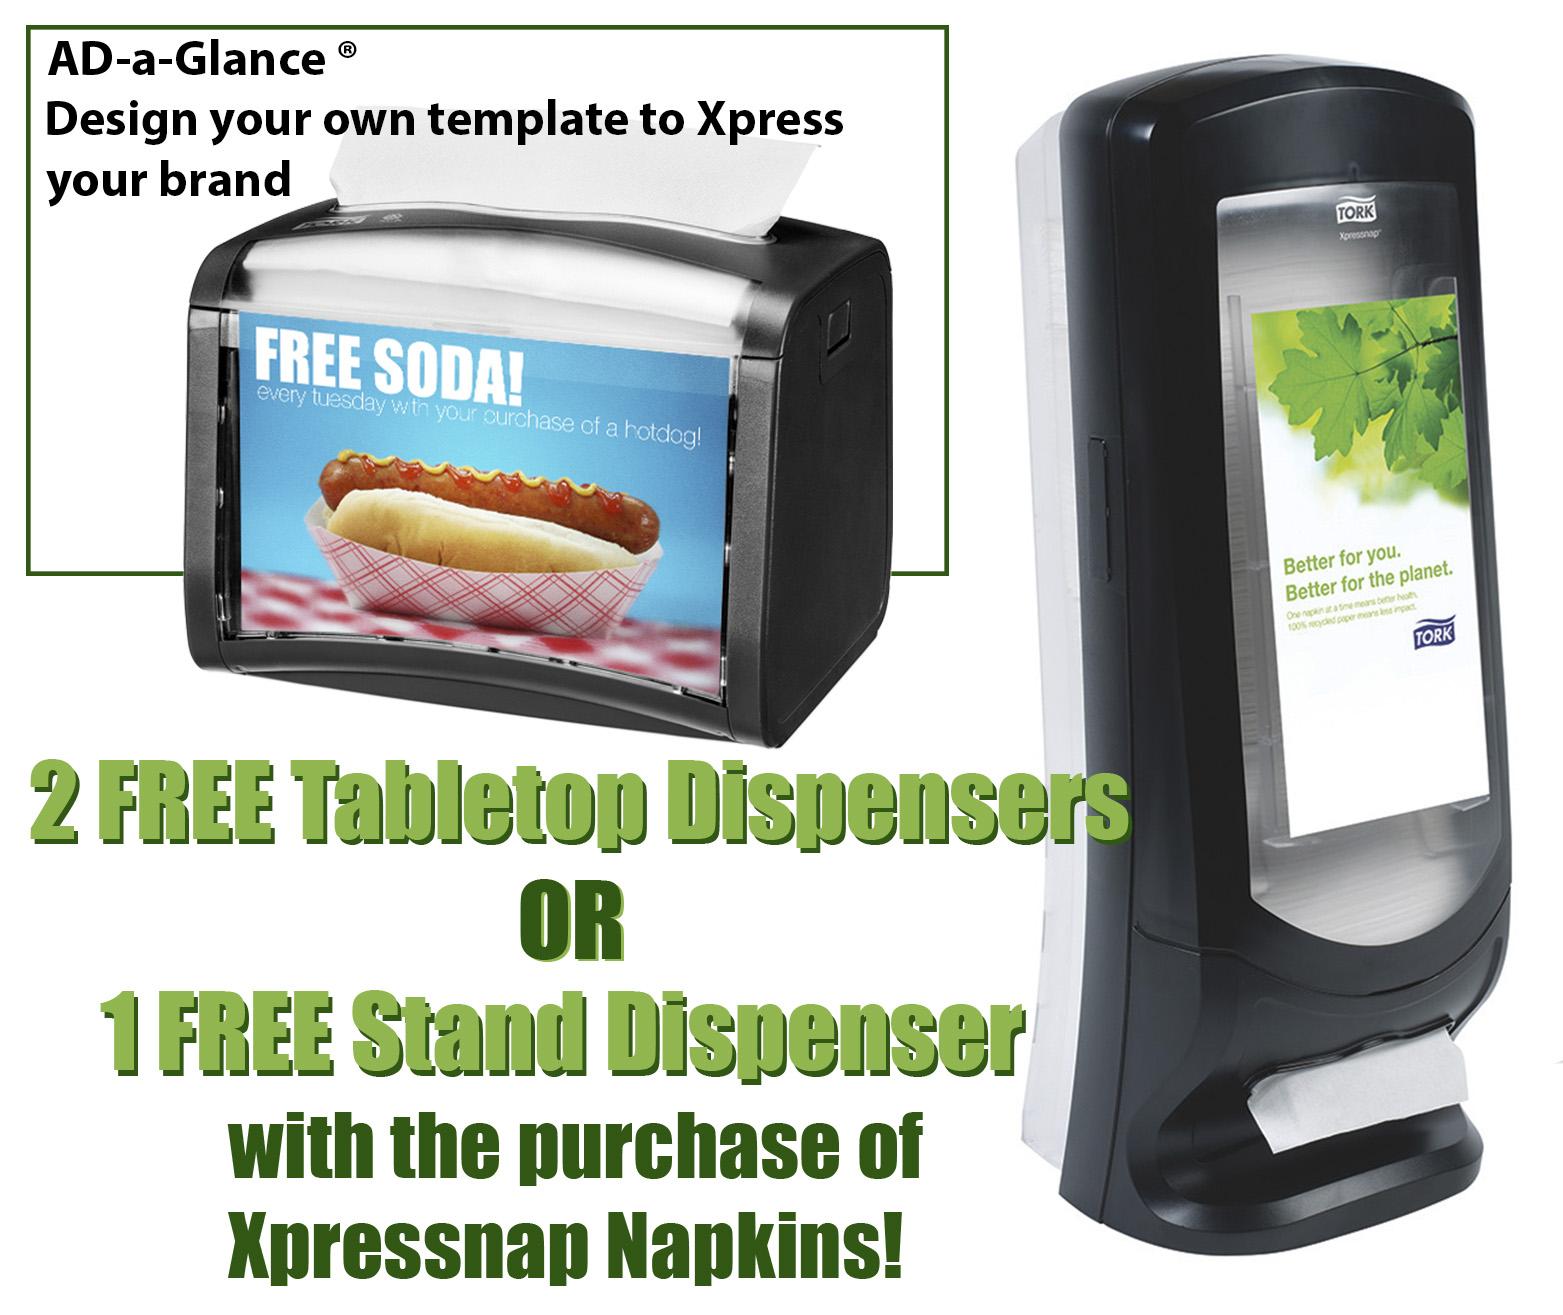 HDi Xpressnap Dispensers